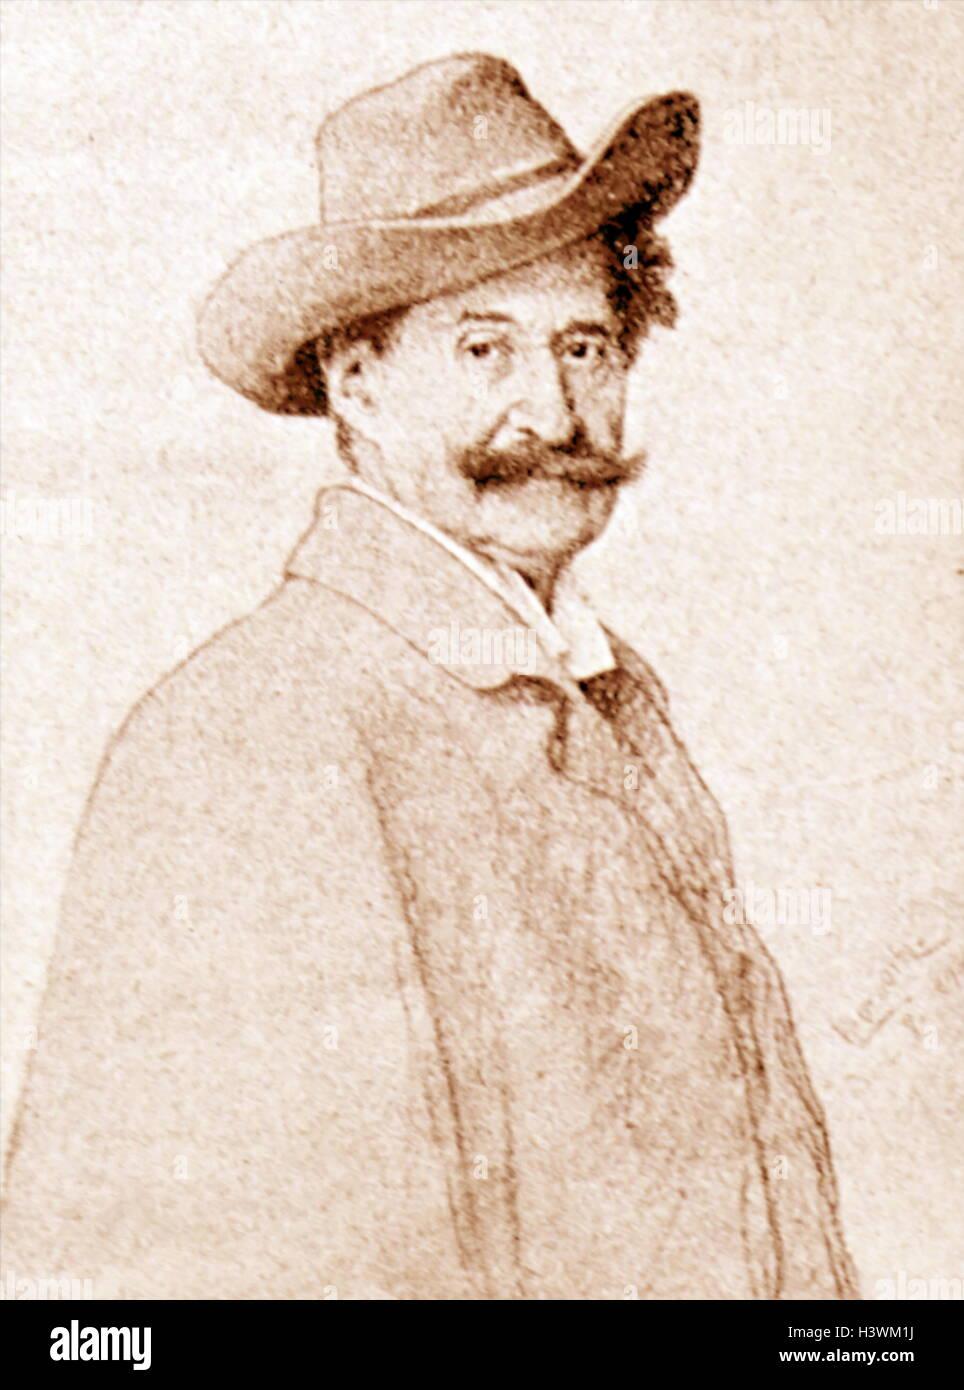 Portrait of Johann Strauss II (1825-1899) an Austrian composer of light music. Dated 19th Century Stock Photo